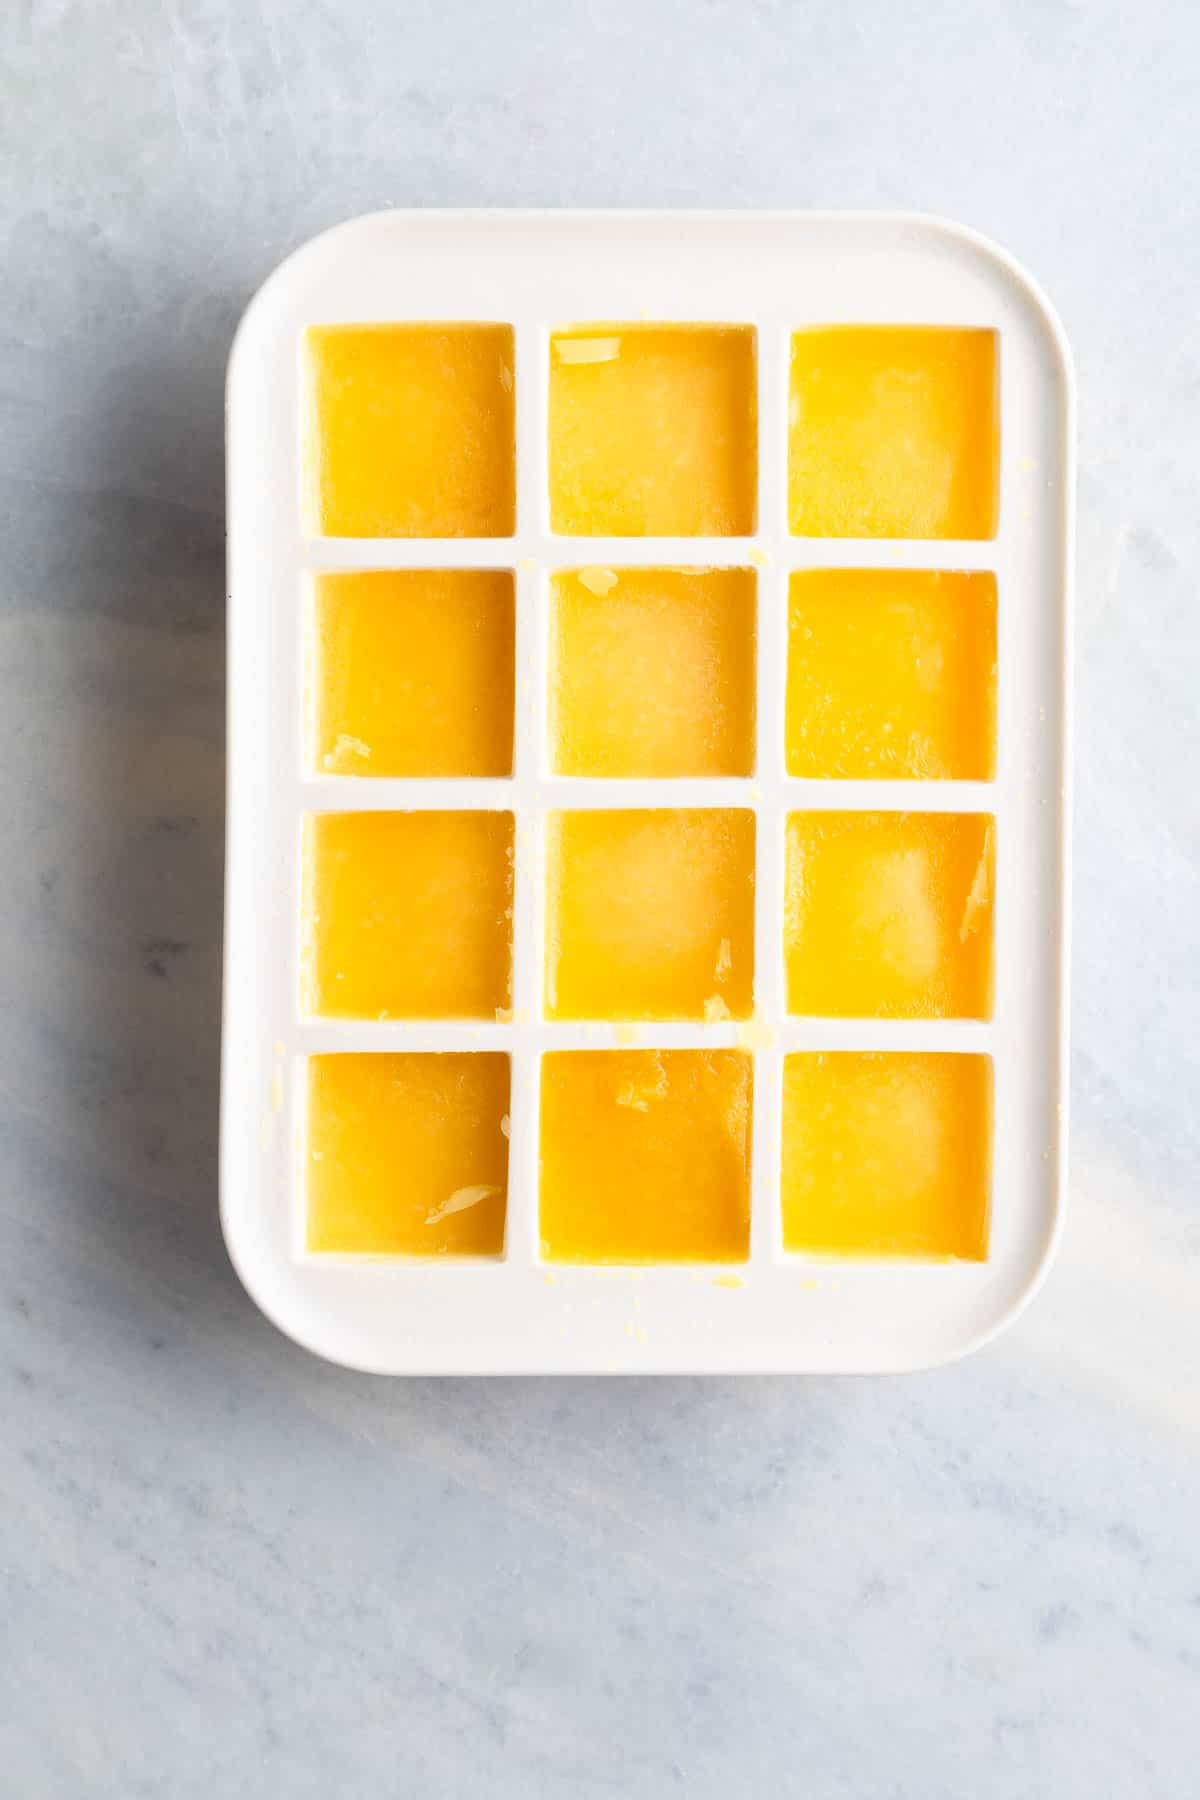 frozen orange juice in a white ice cube tray